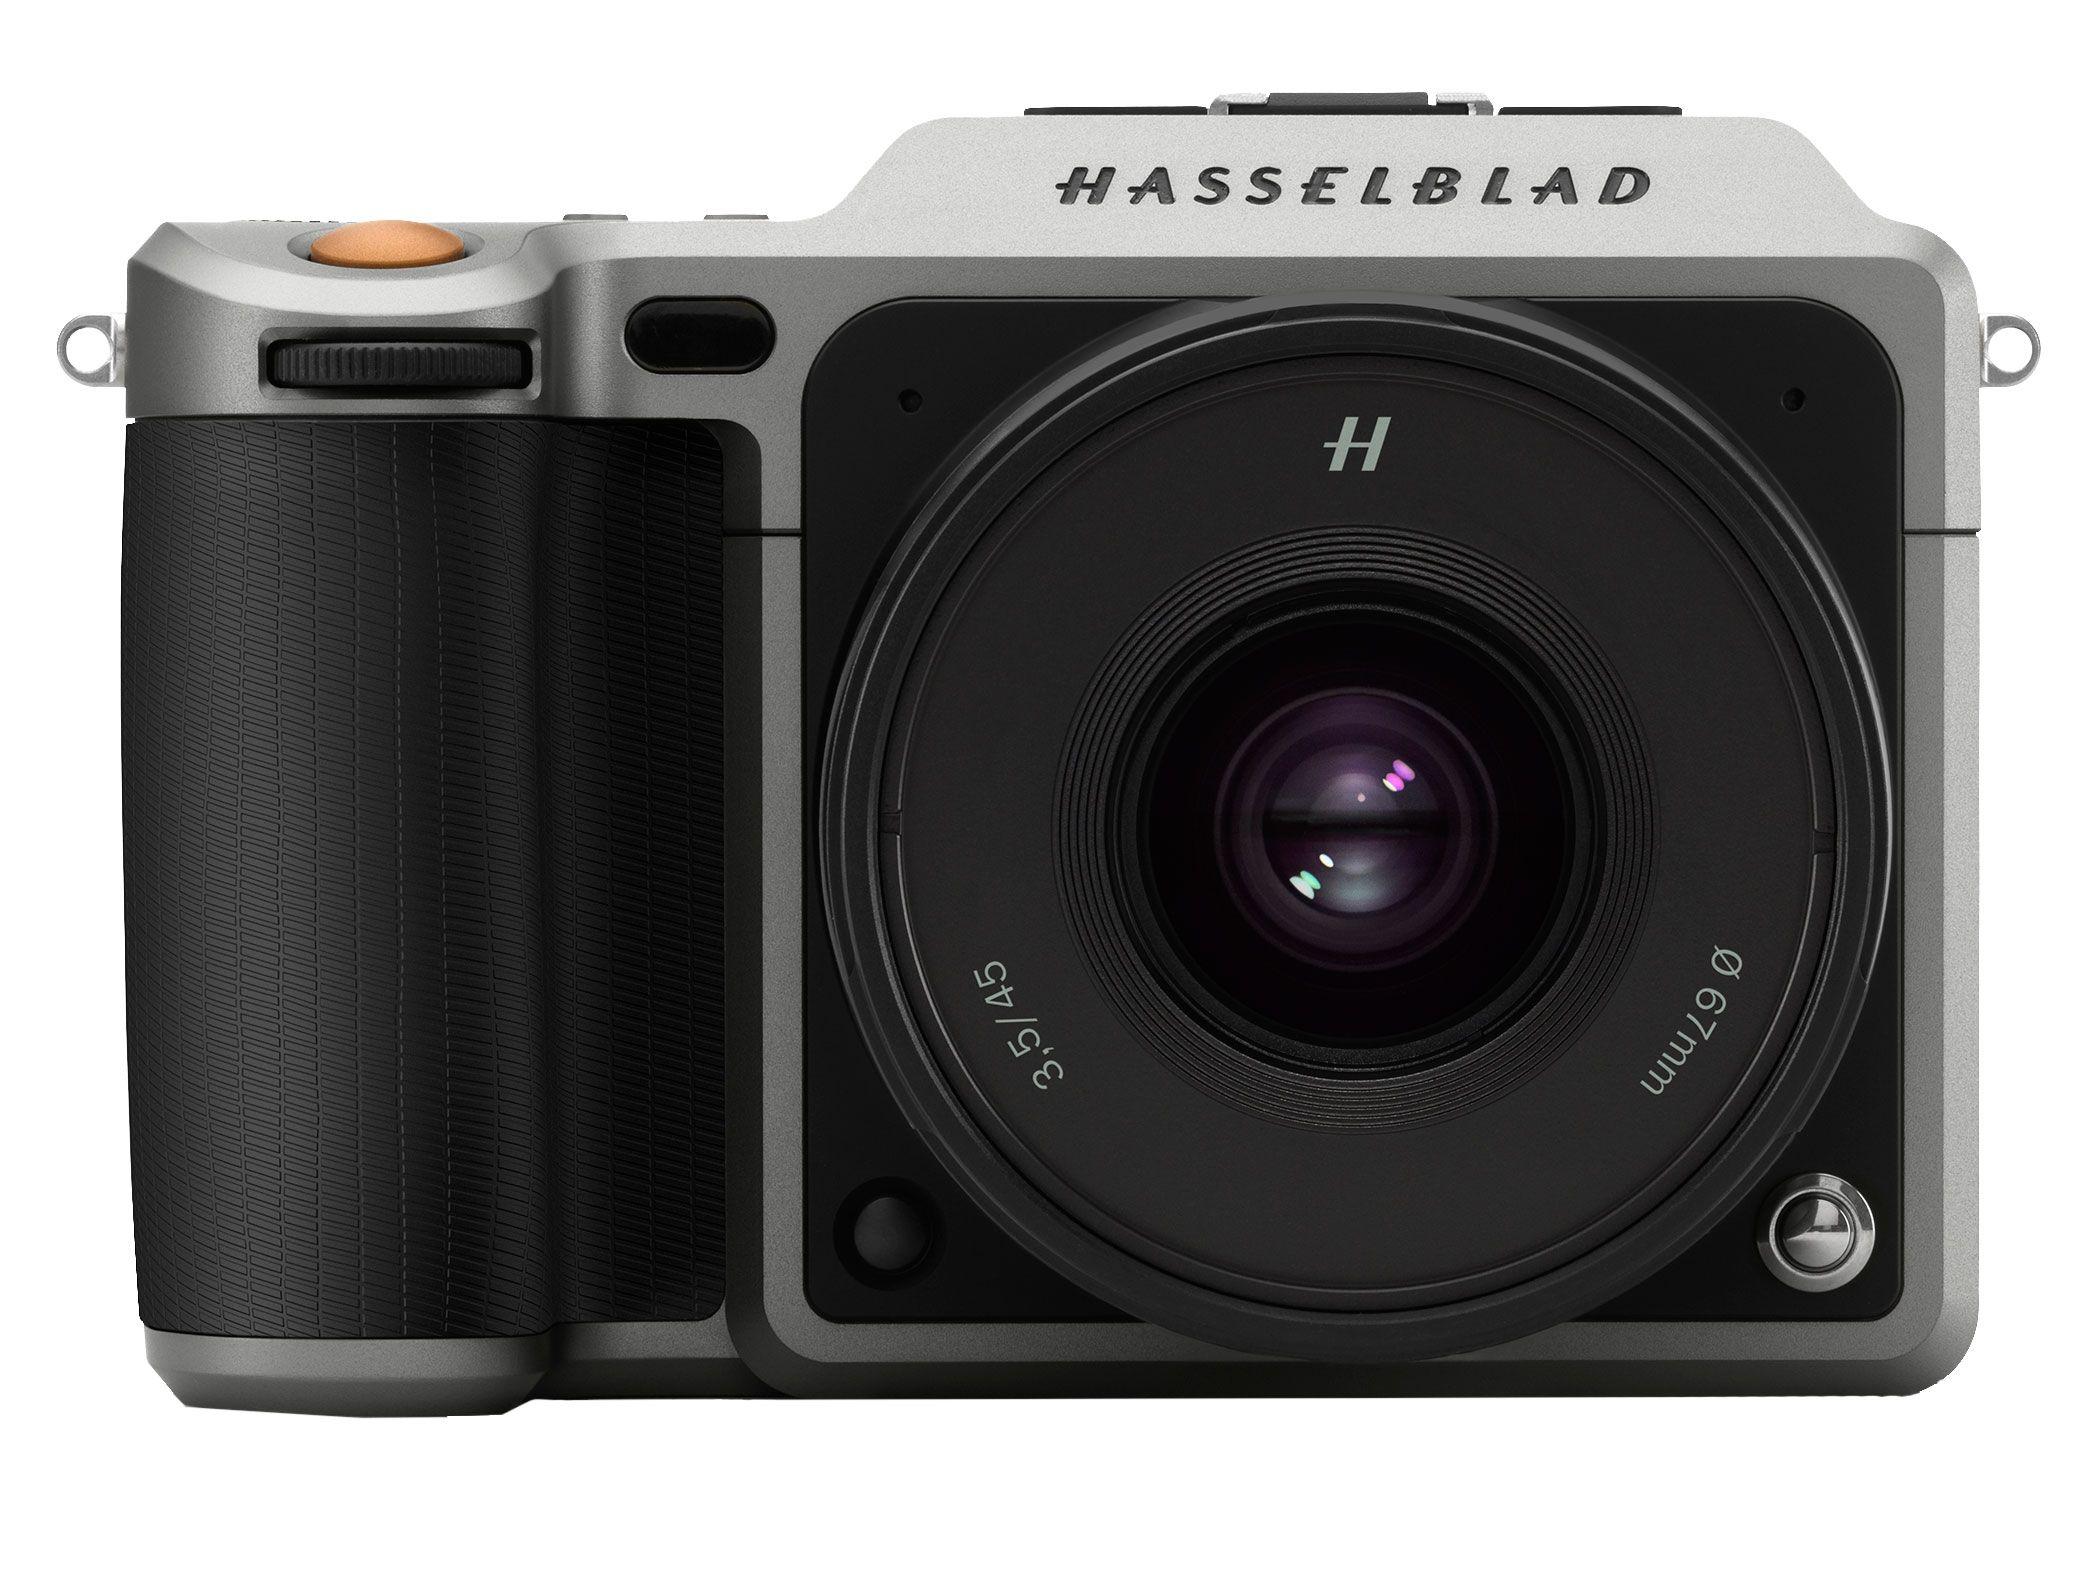 Hasselblad X1d Mirrorless Camera Hasselblad Medium Format Camera